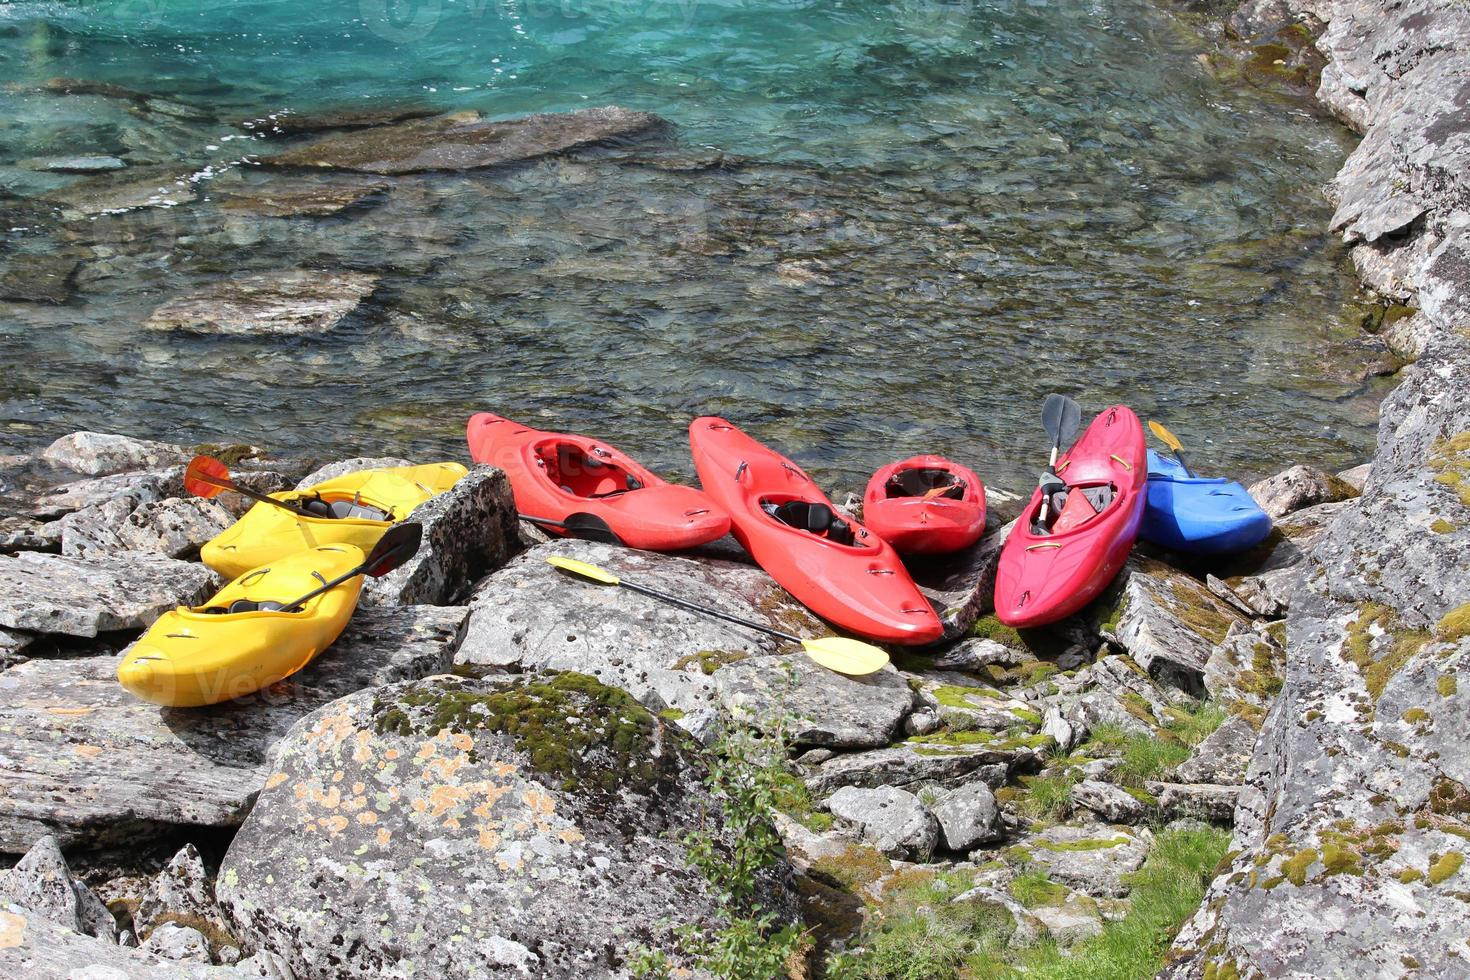 siete kayaks en la orilla del río. foto